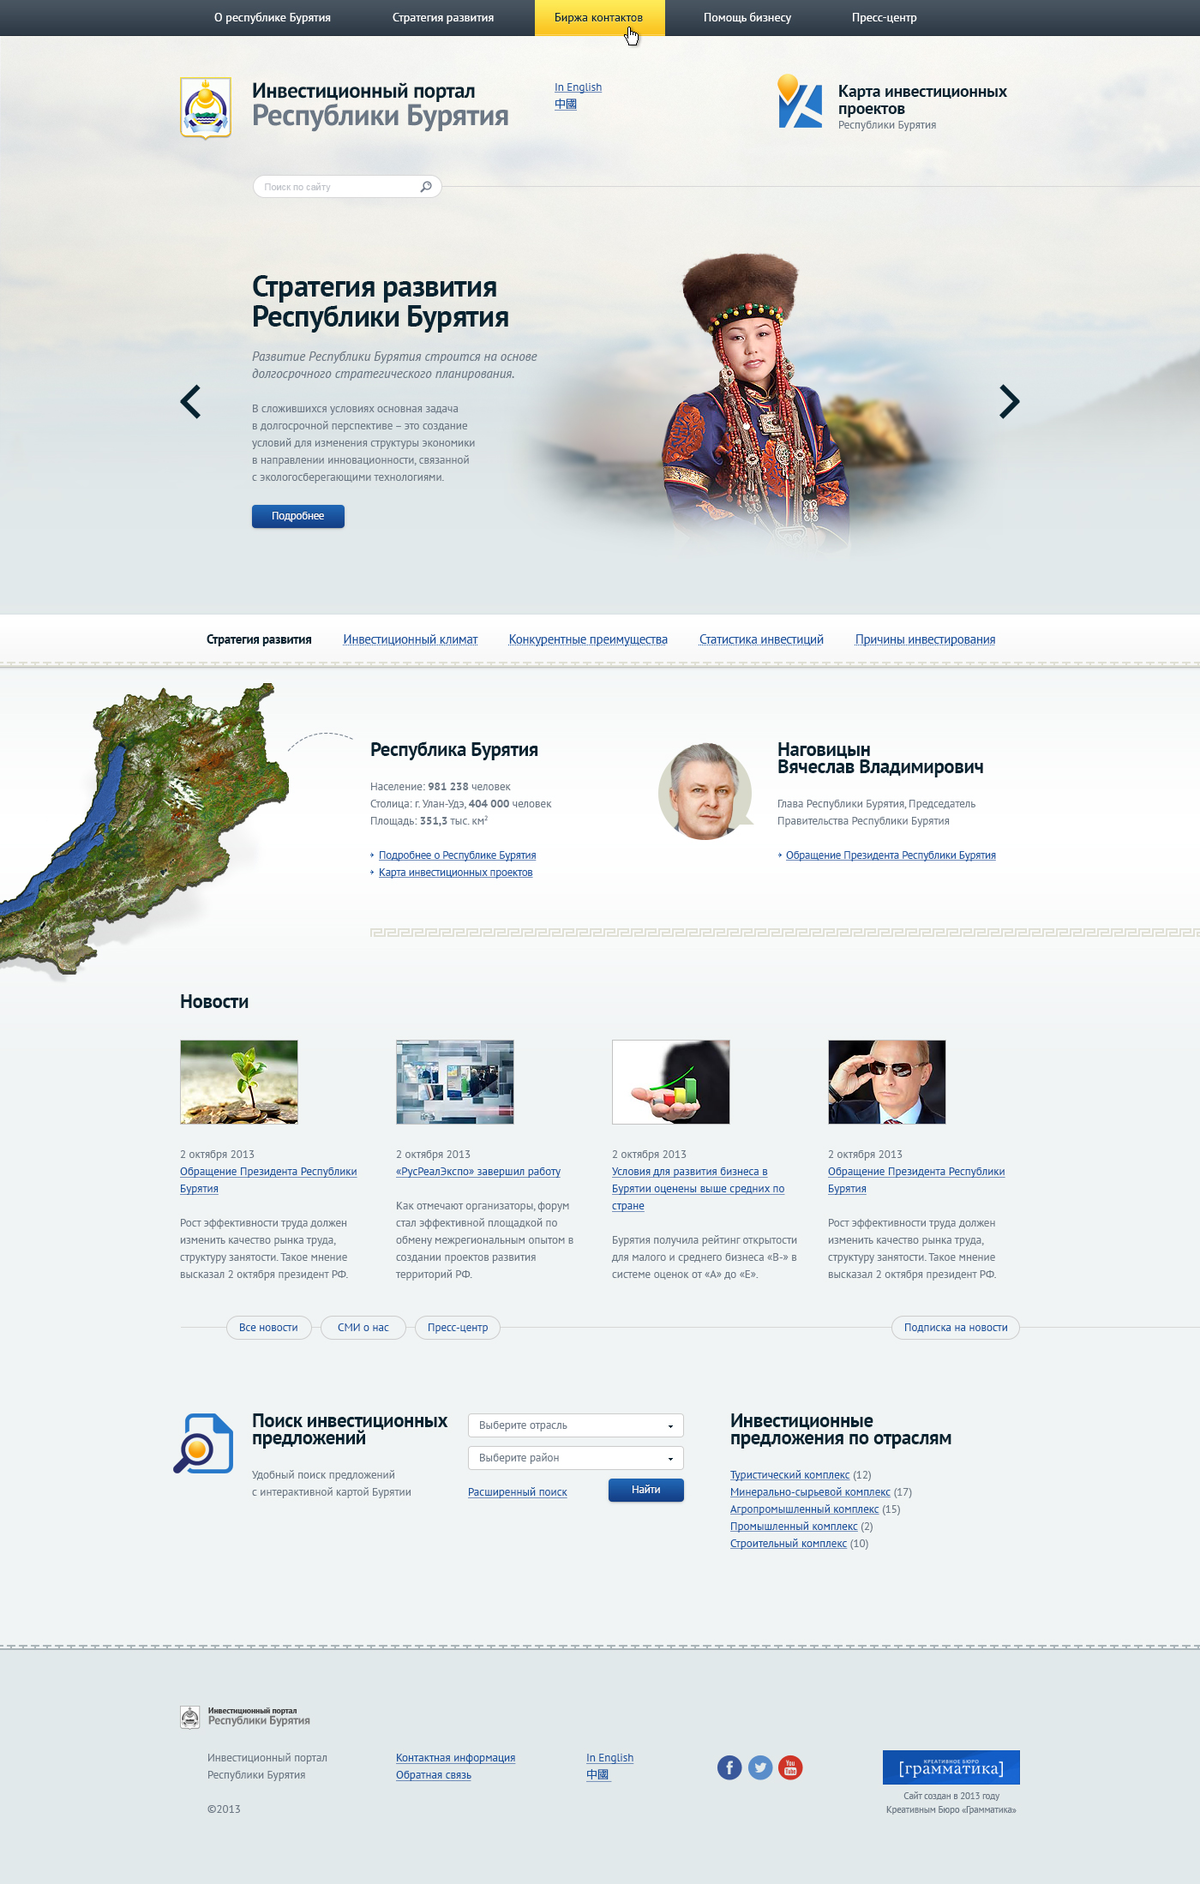 Портал Республики Бурятия / Проект компании Креативное Бюро «Грамматика»